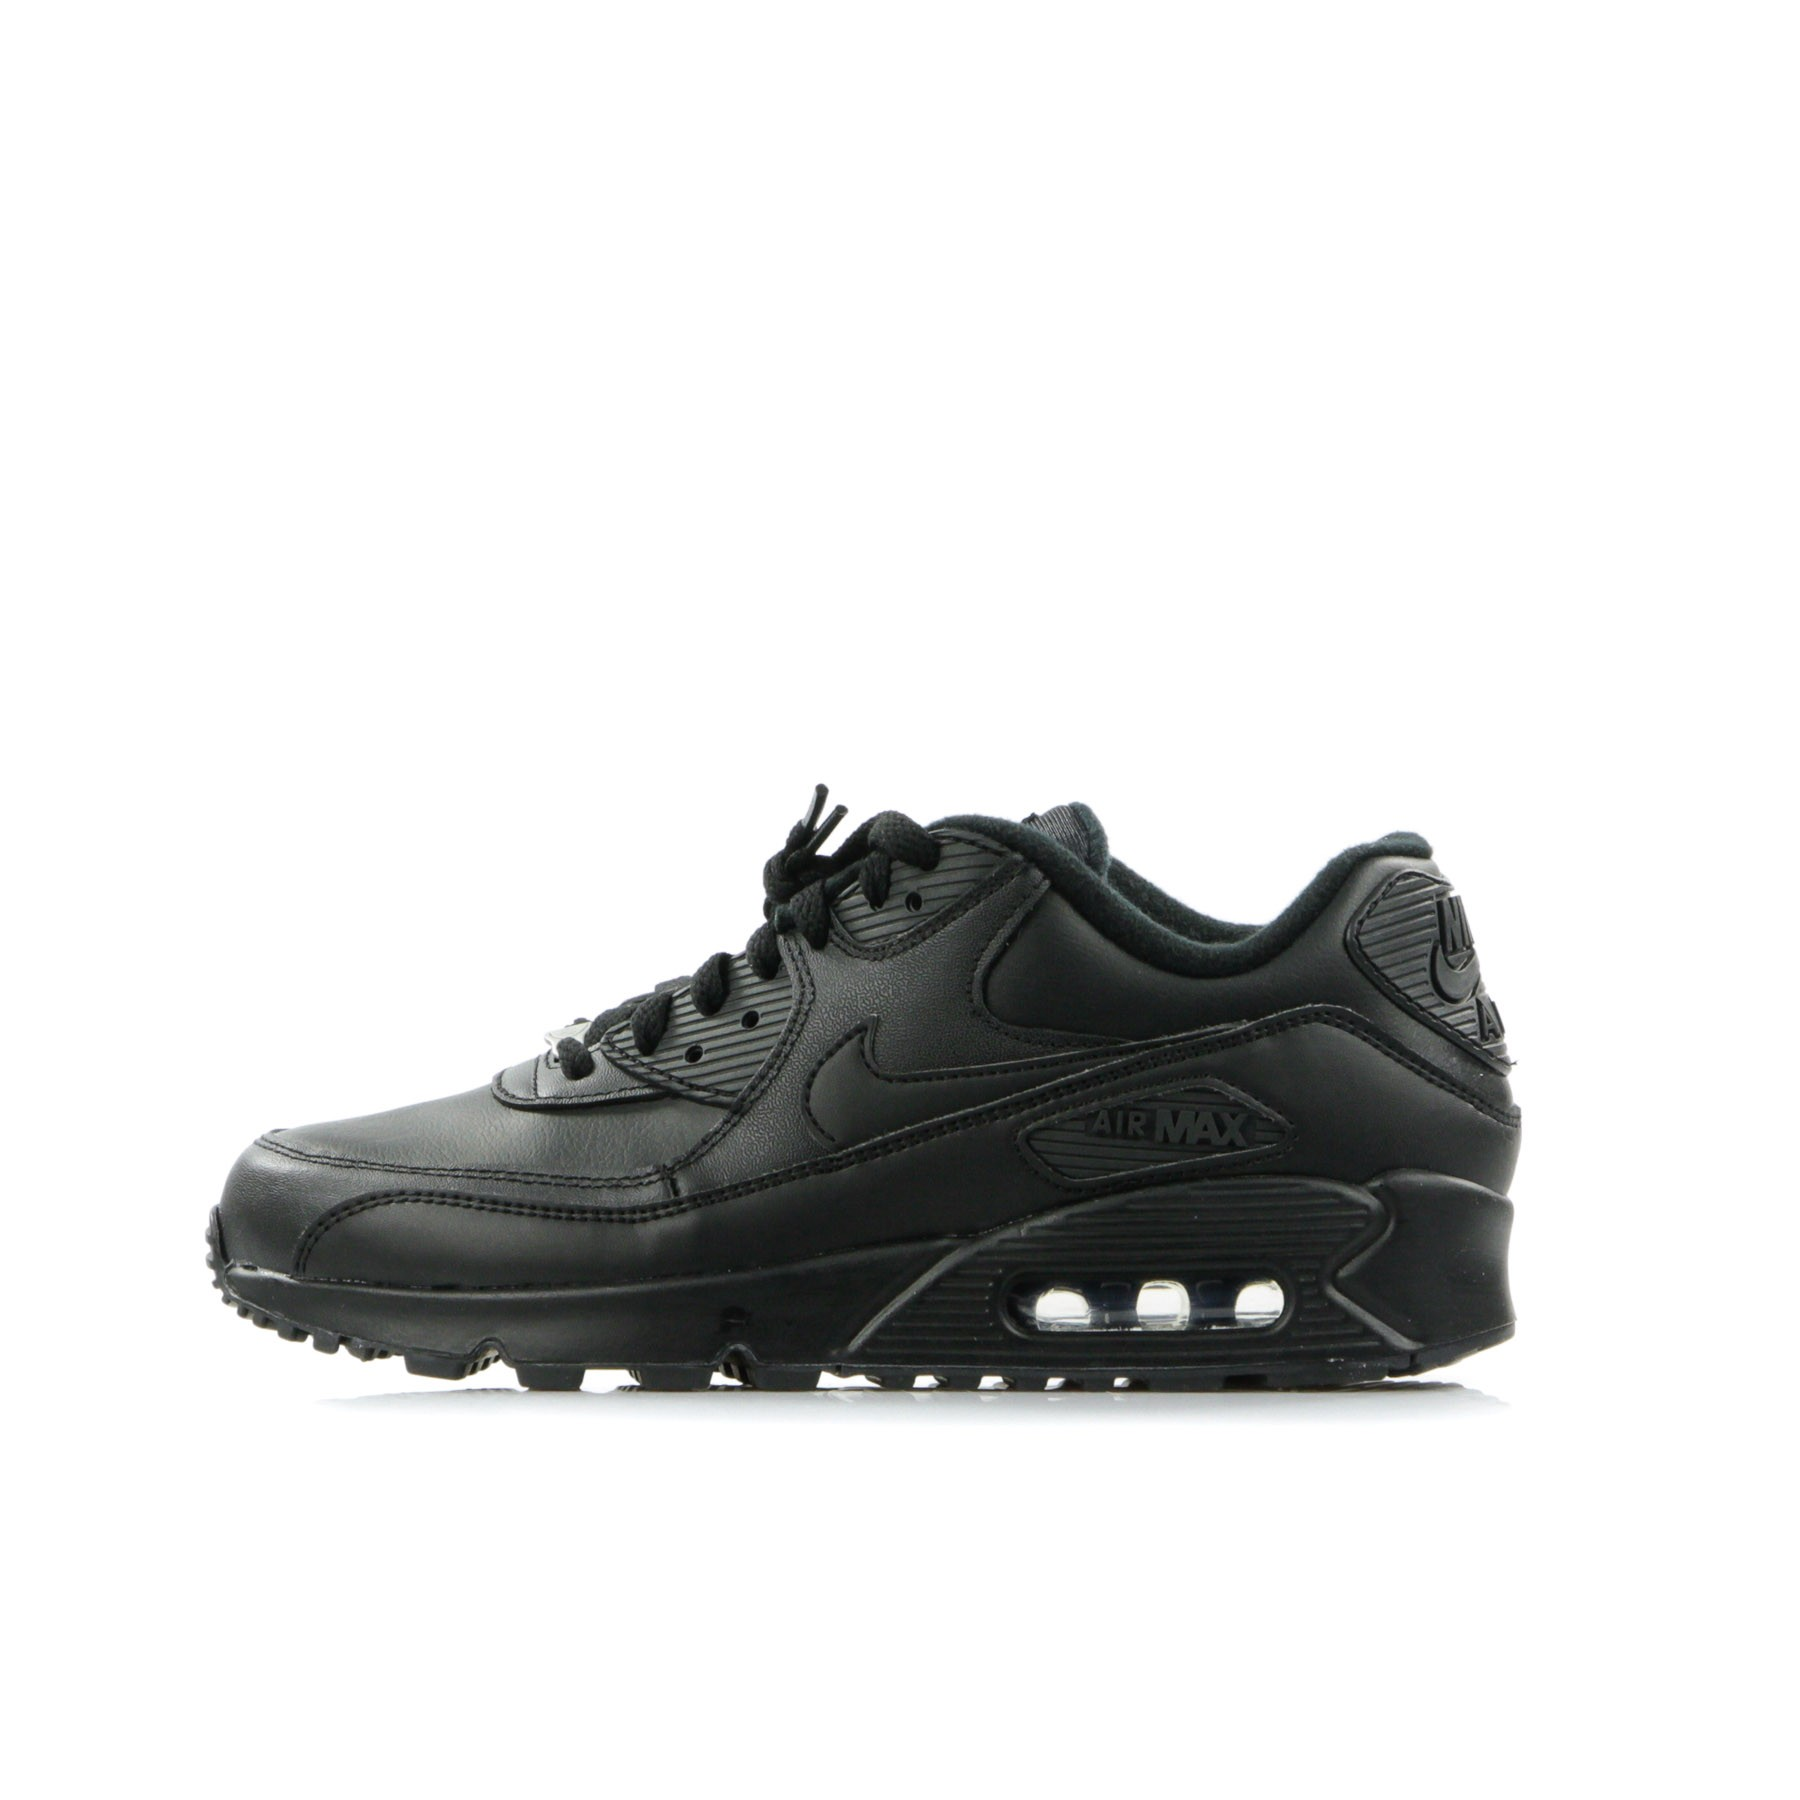 Nike Air Max 90 Leather BlackBlack 302519 001